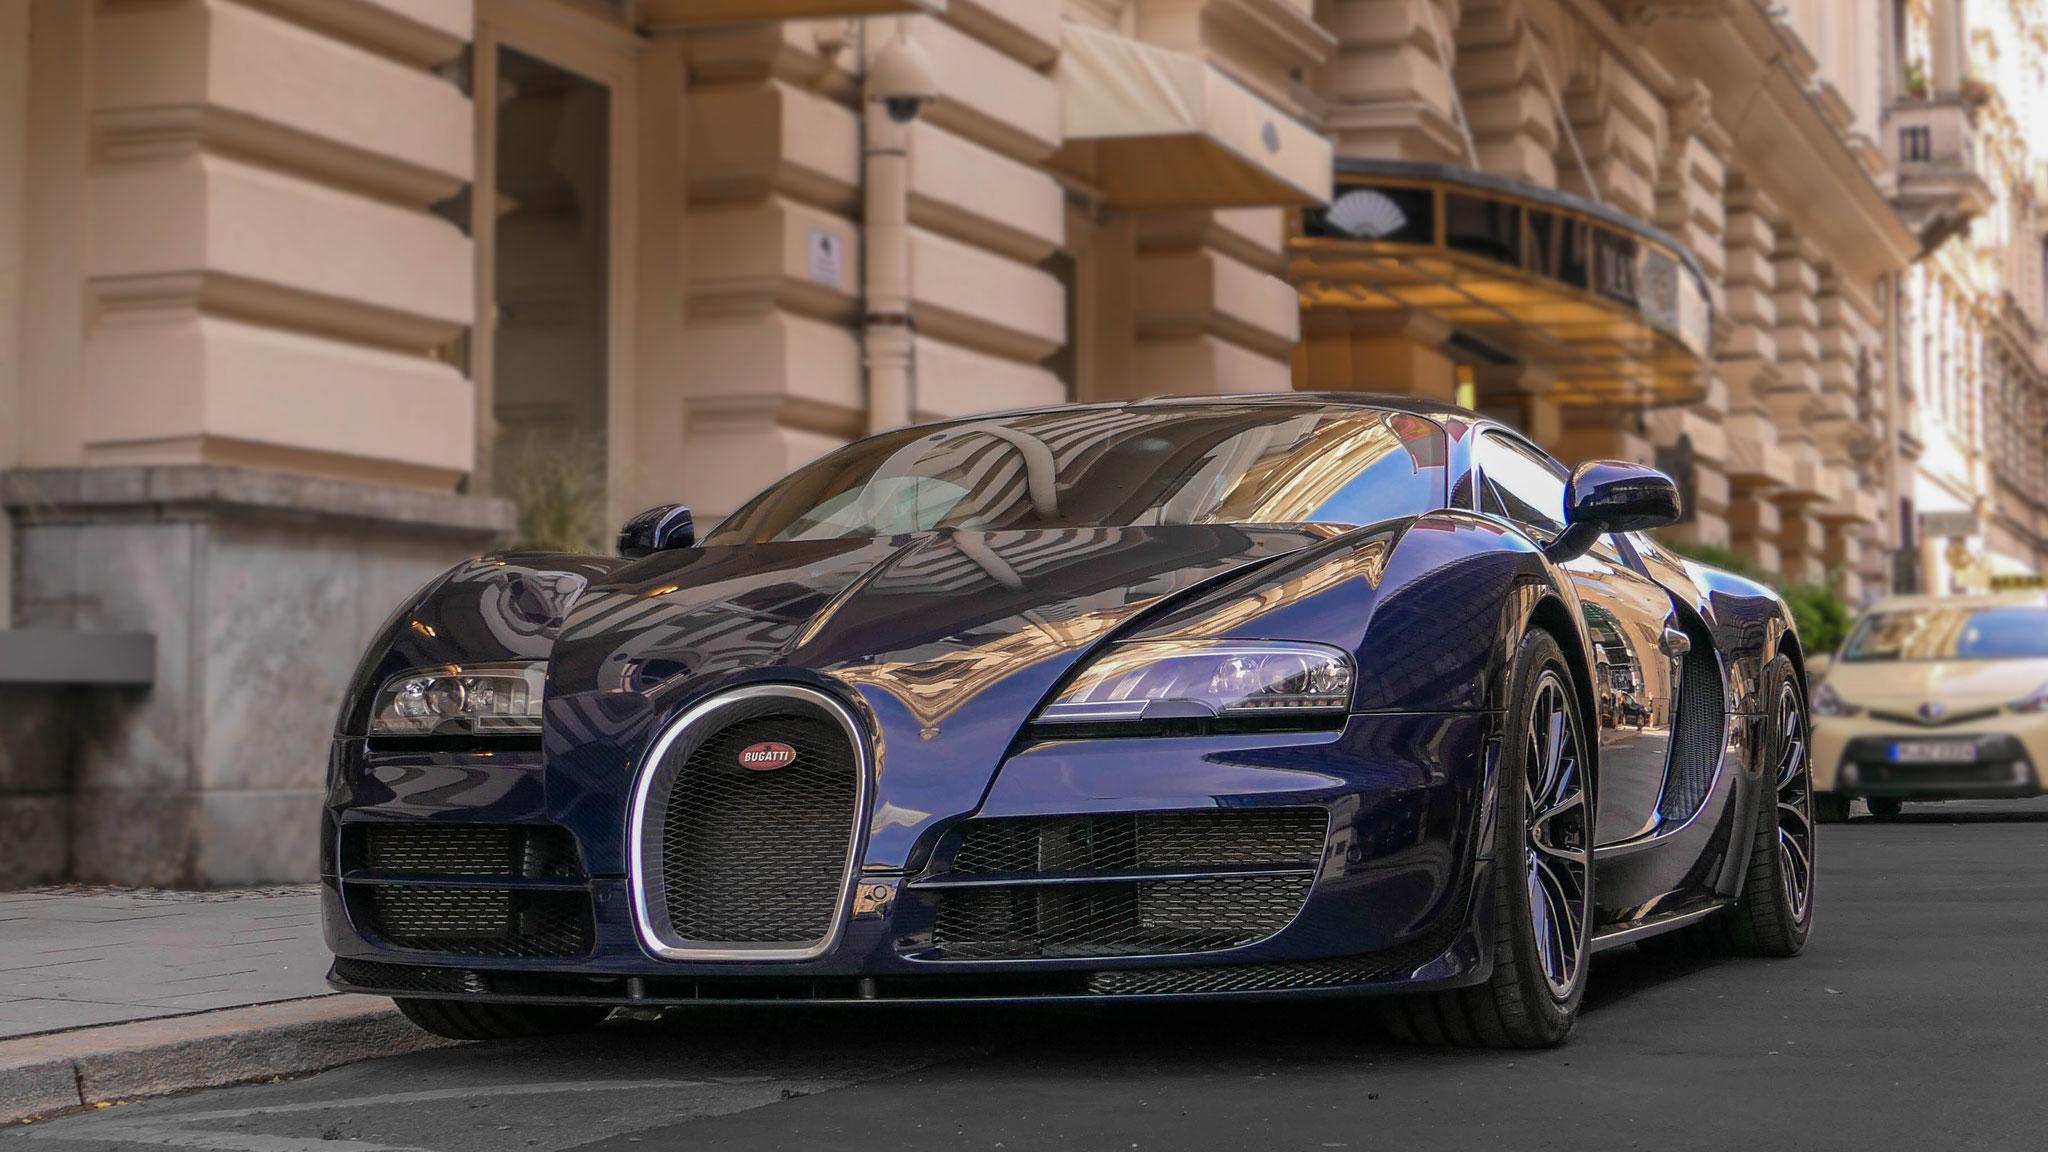 Bugatti Veyron Super Sport - FL-37878 (LIC)